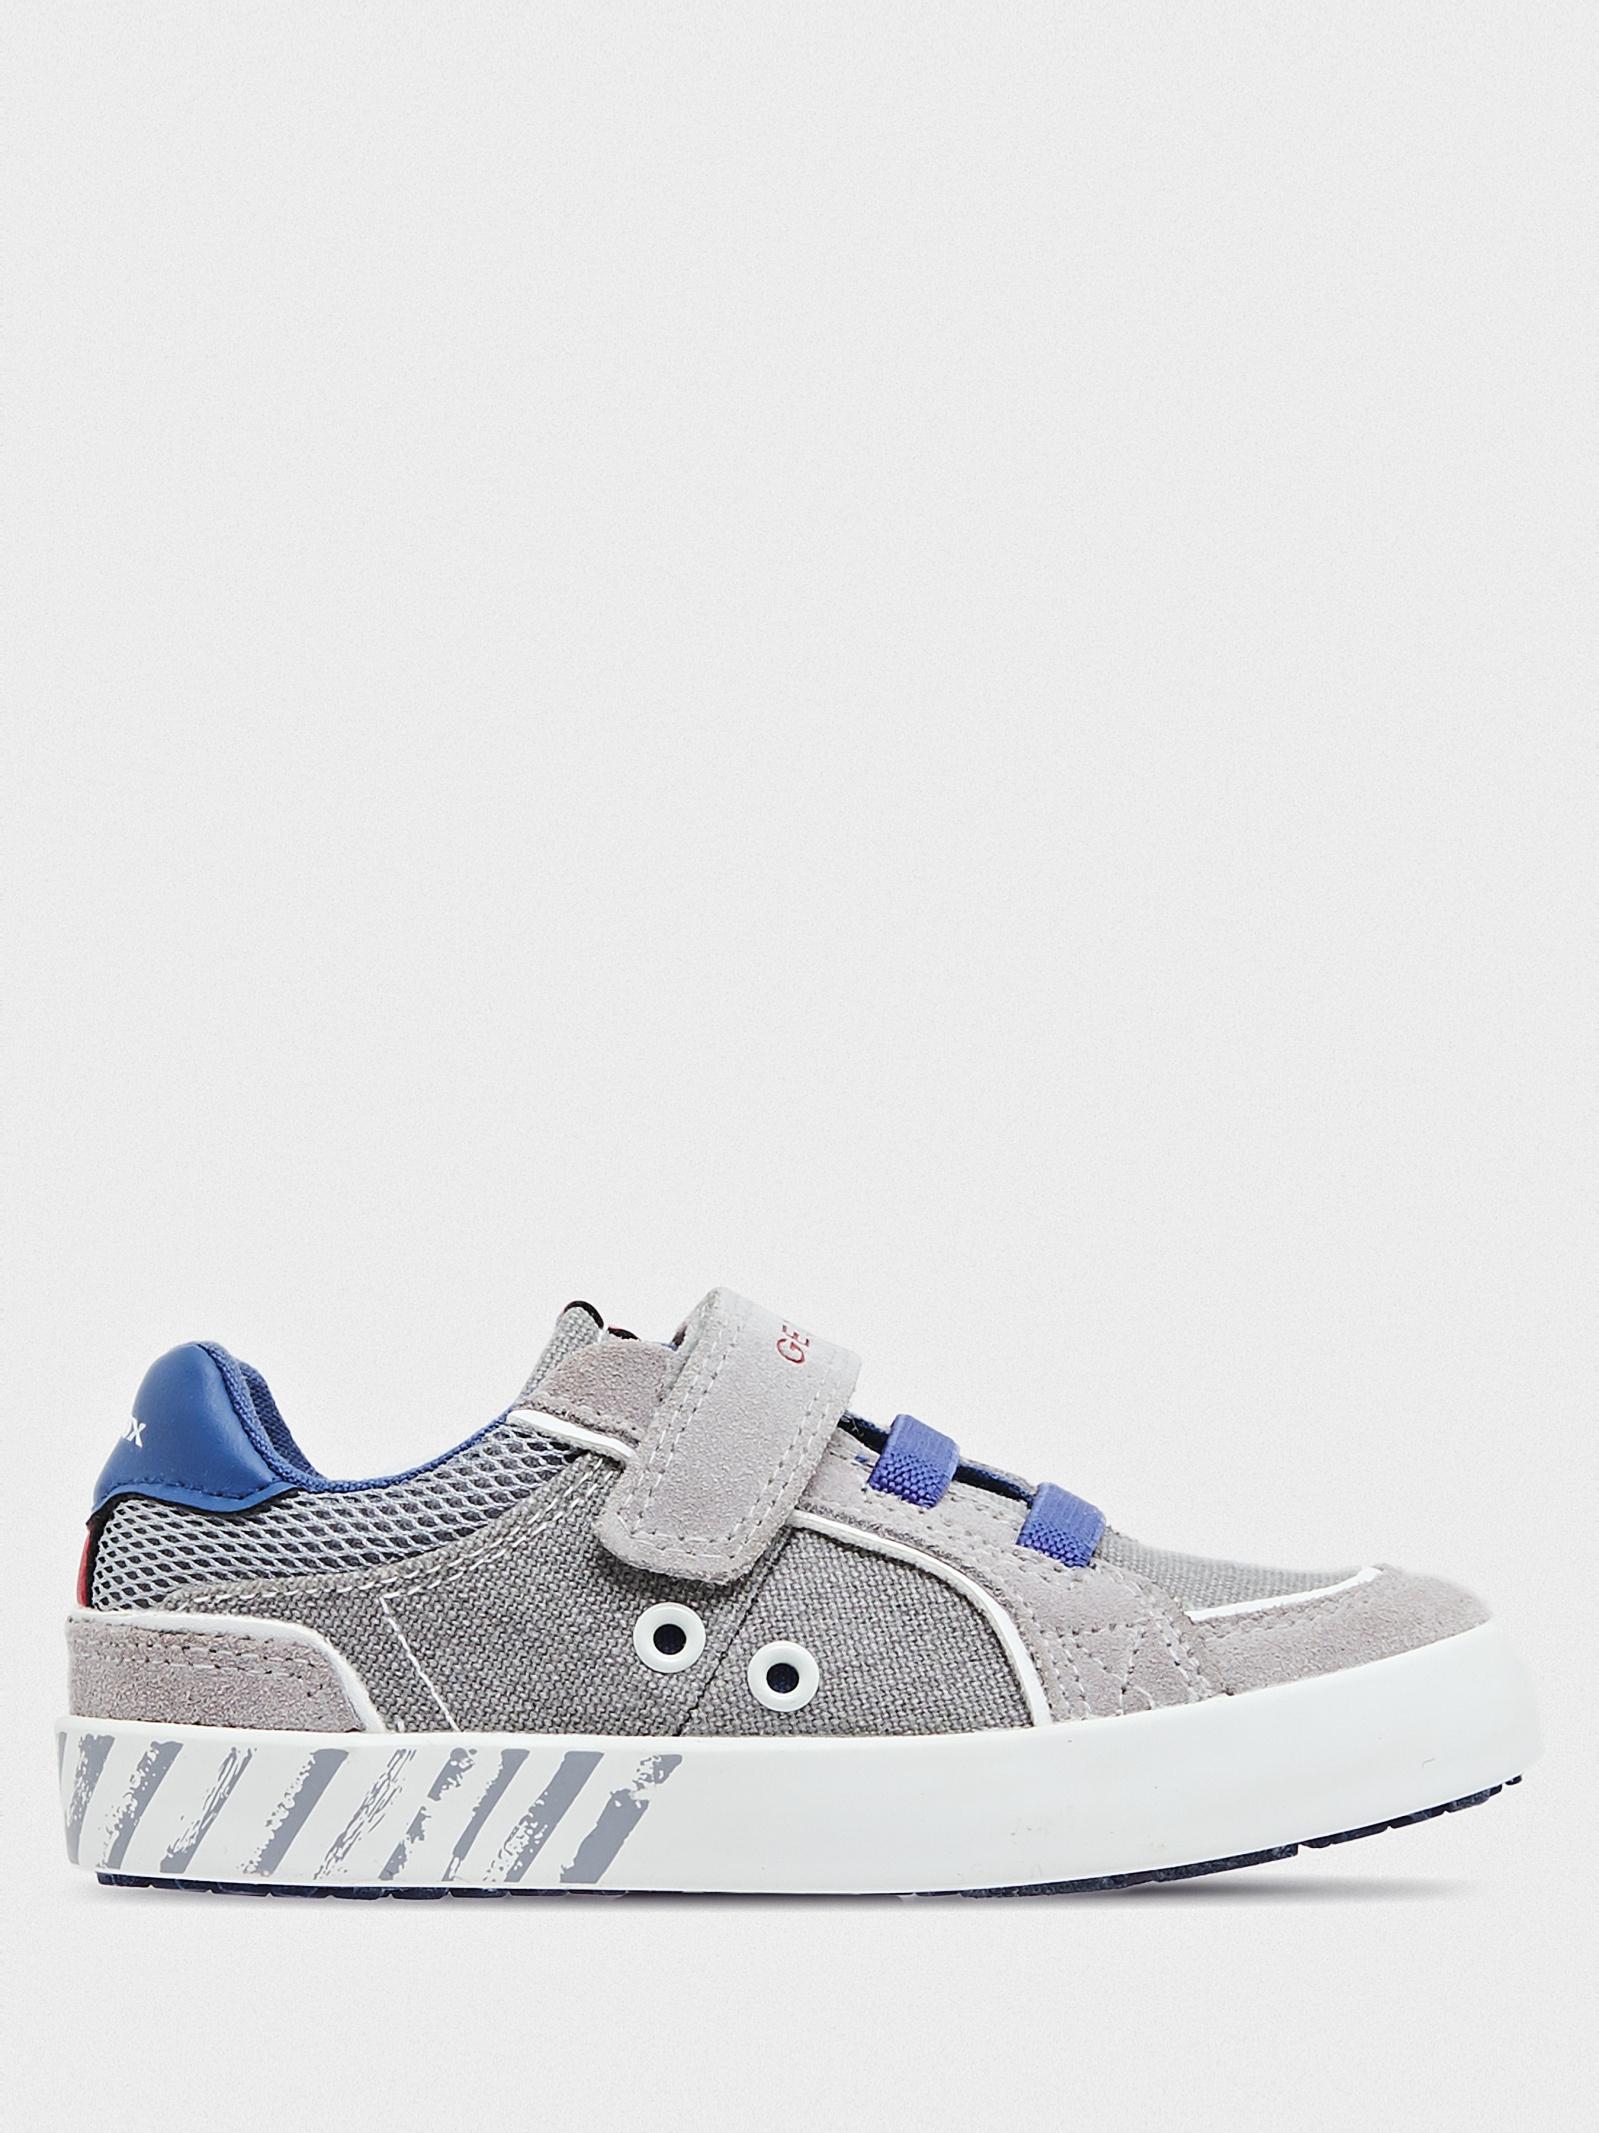 Полуботинки детские Geox B KILWI BOY B02A7B-0NB22-C0493 модная обувь, 2017